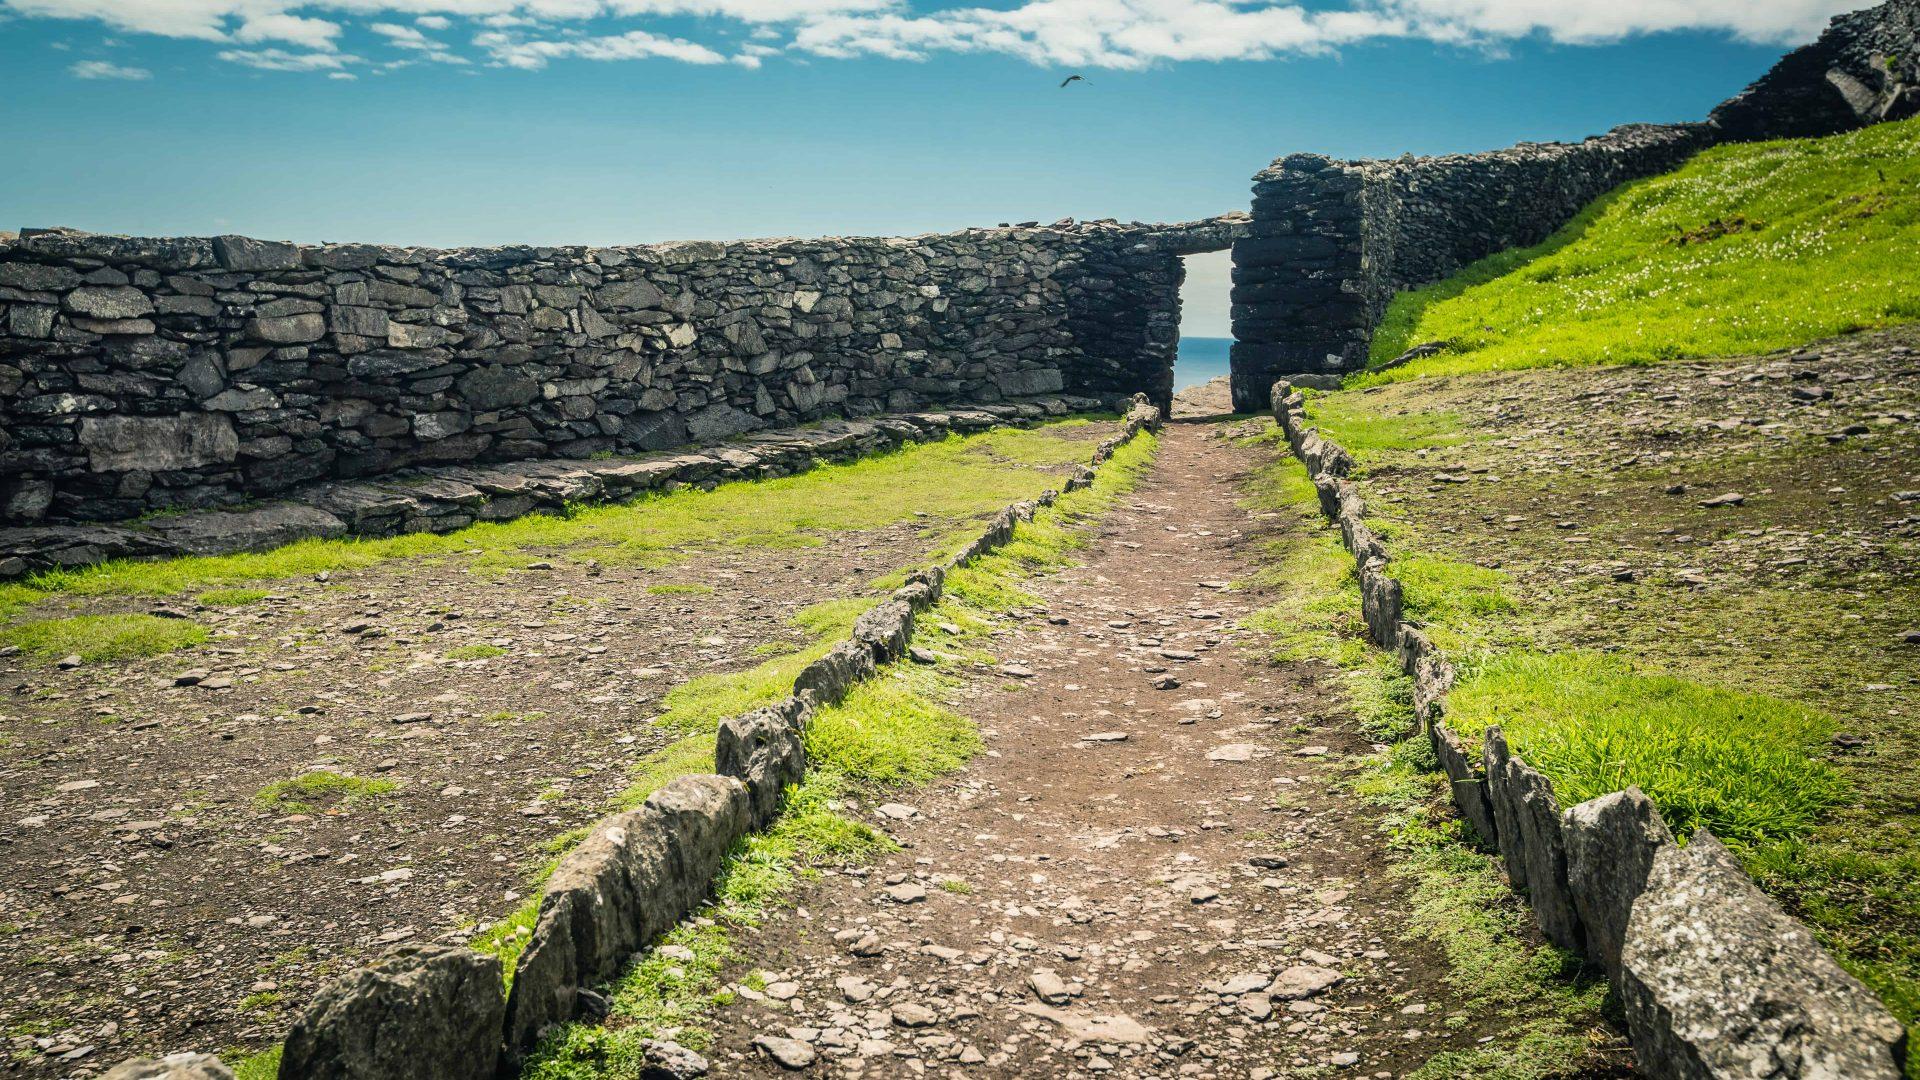 Ireland-SkelligMichael-Monastry-CasparDiederik-1415